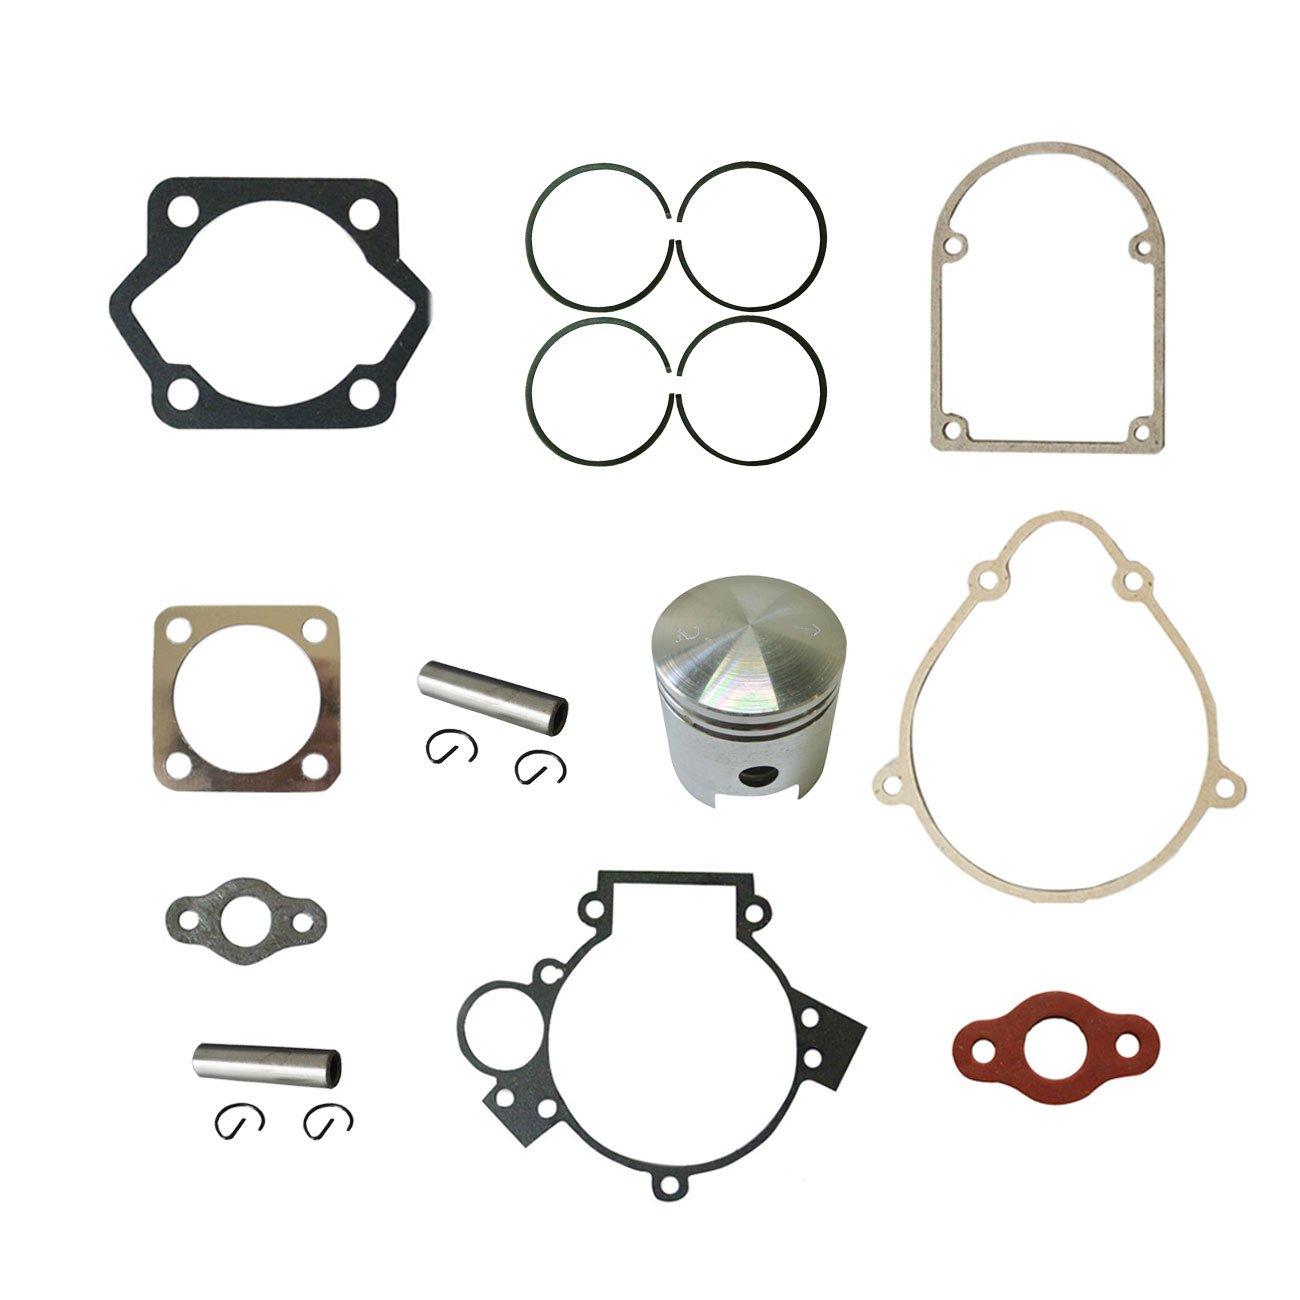 JRL Piston&2xPin Clips Wrist&Gasket Set Fit 80cc Motorized Bicycle Bike Motor Huang Machinery